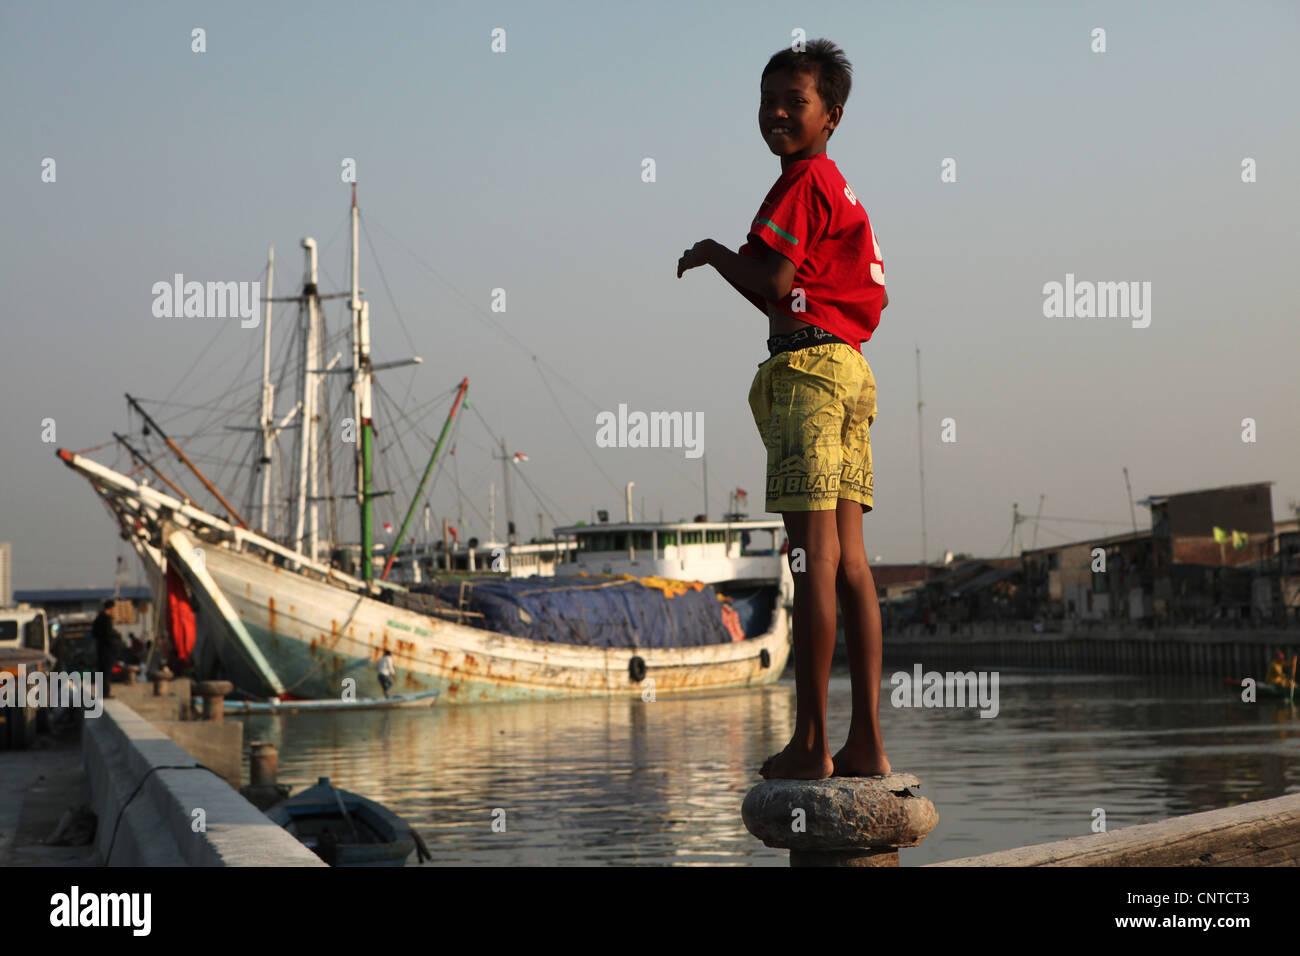 Wooden sailing ships called 'pinisi' in the historical port of Sunda Kelapa in Jakarta, Indonesia. - Stock Image